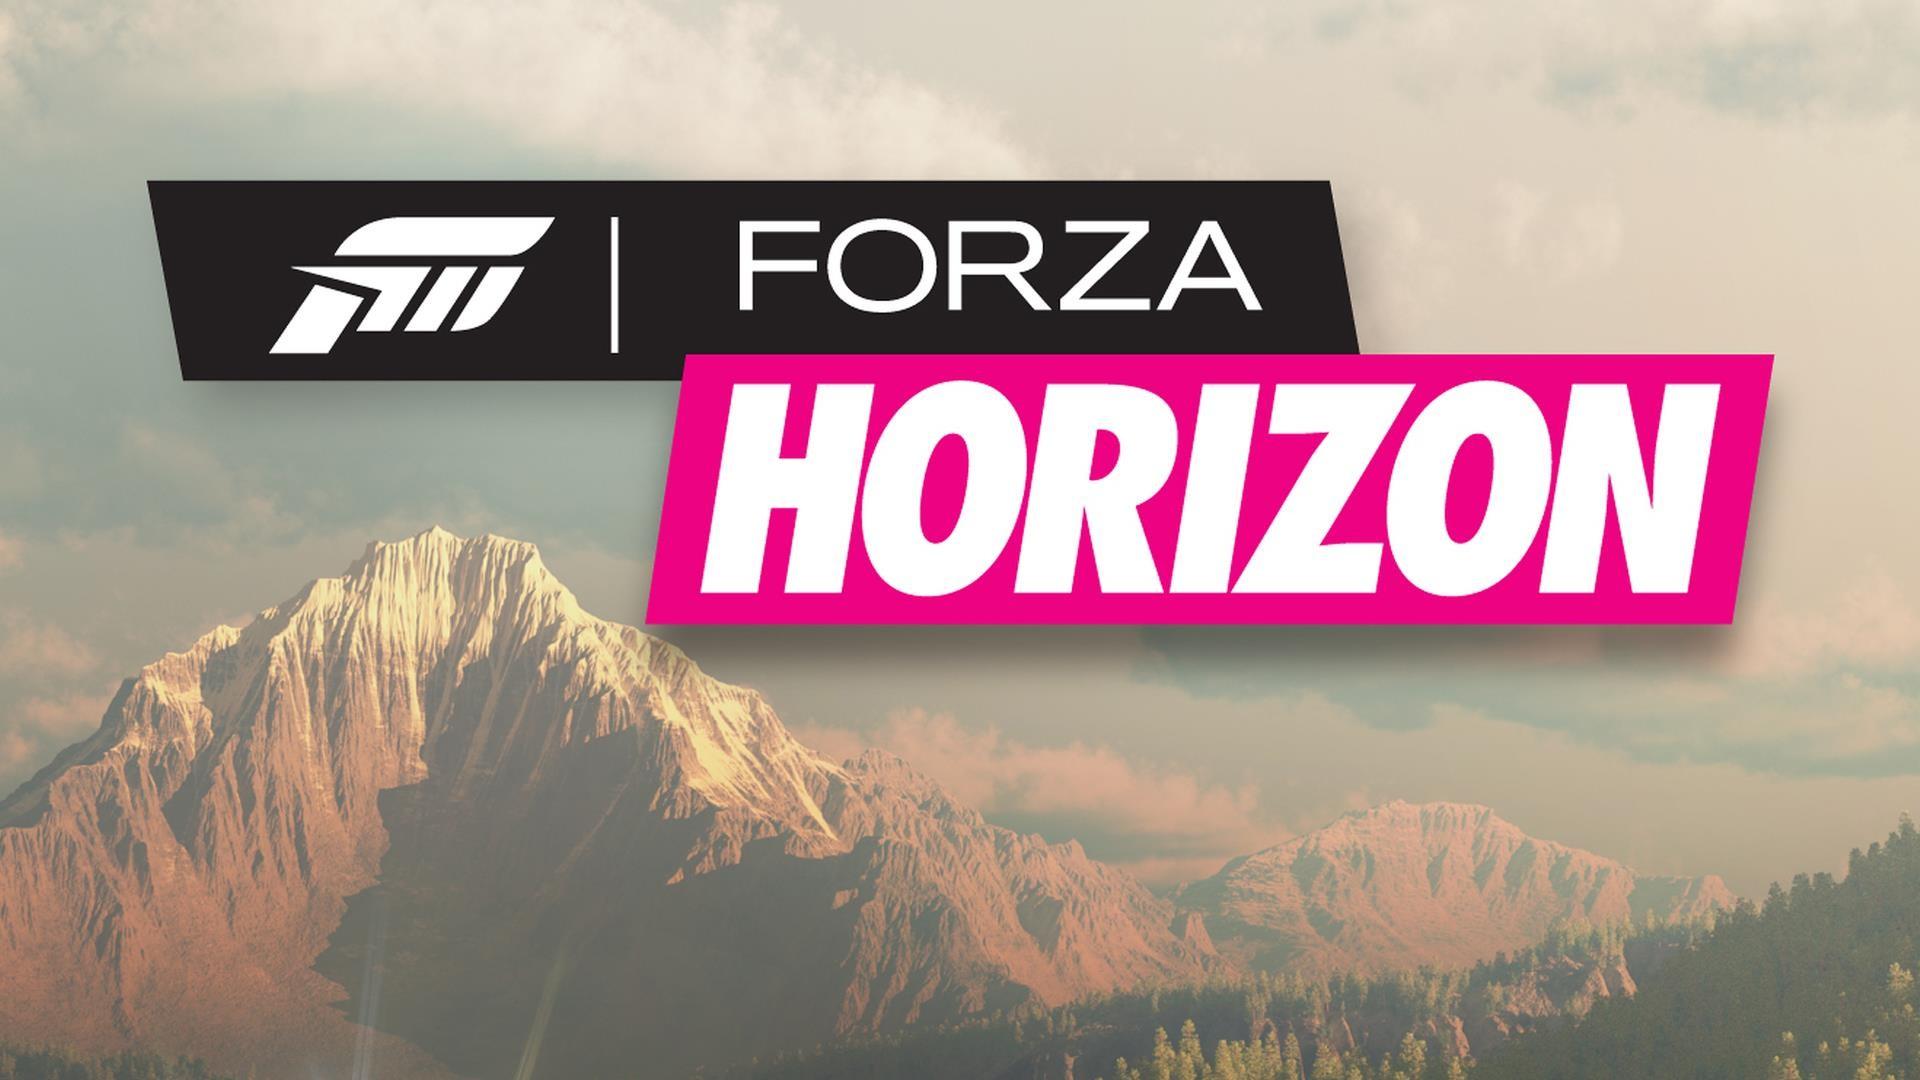 Forza horizon logo by acersense on deviantart - Forza logo wallpaper ...